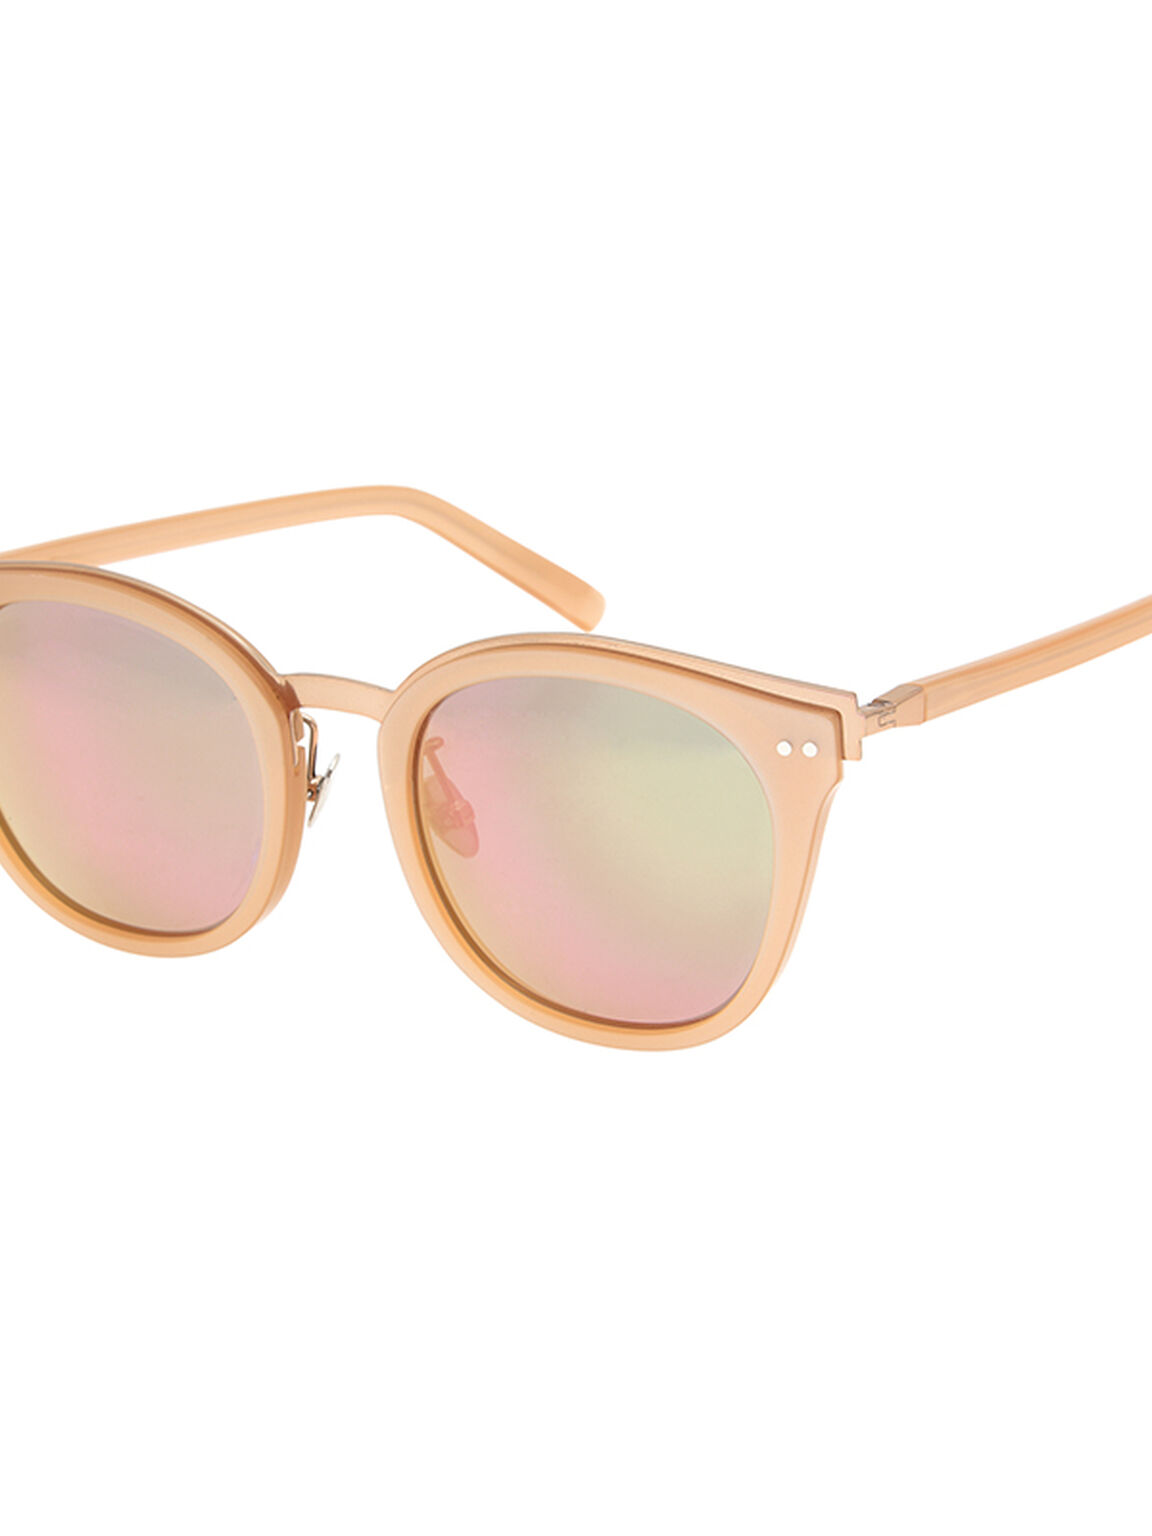 Round Wayfarer Sunglasses, Pink, hi-res